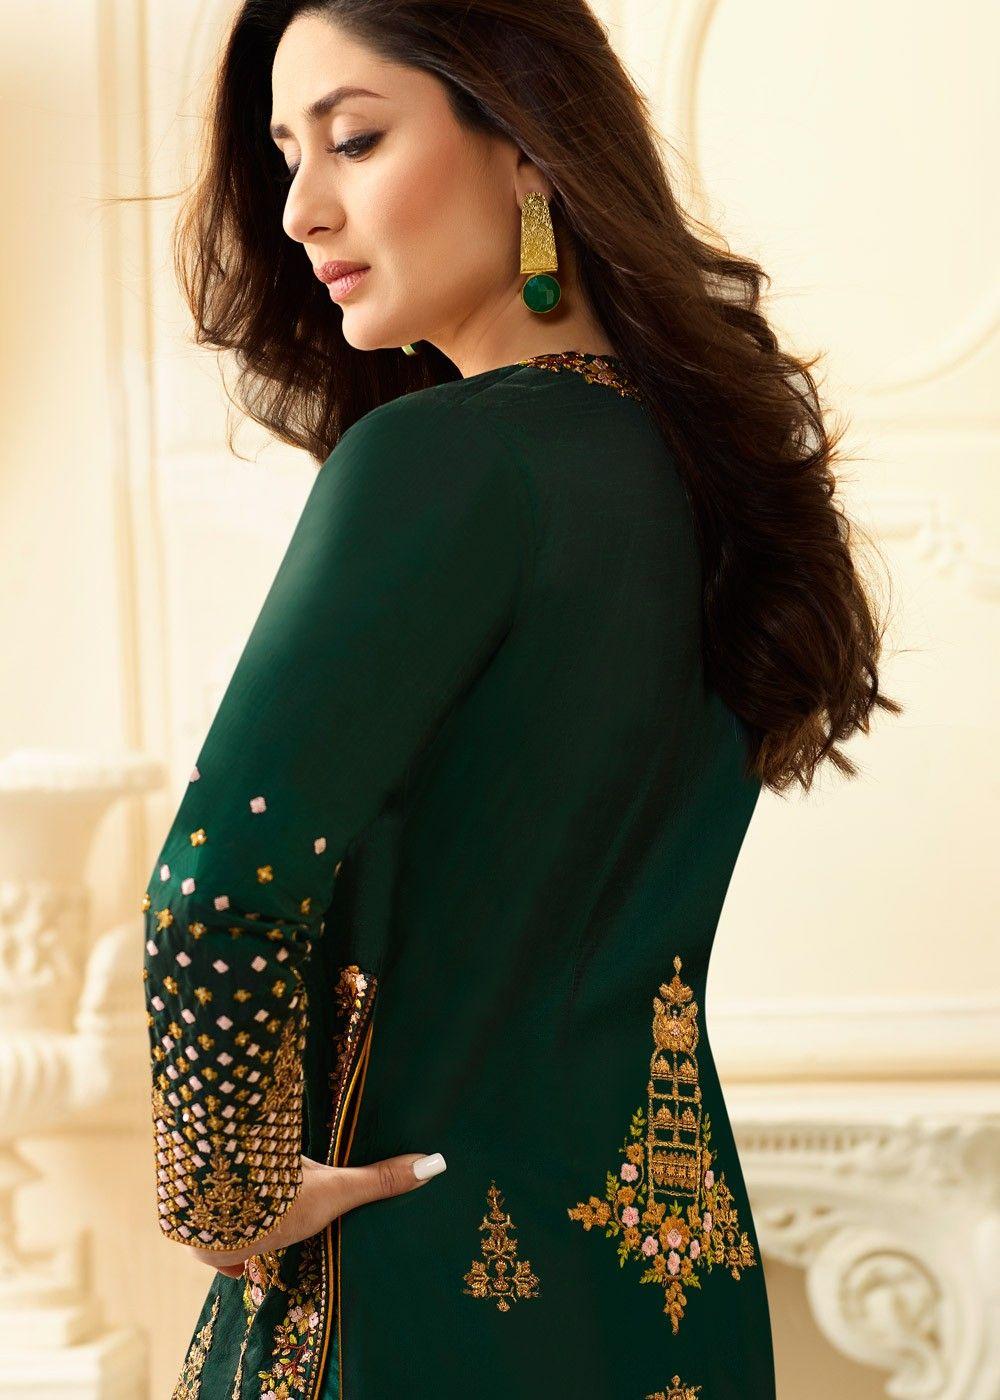 Bollywood Actresses in Anarkali  |Kareena In Green Anarkali Dress